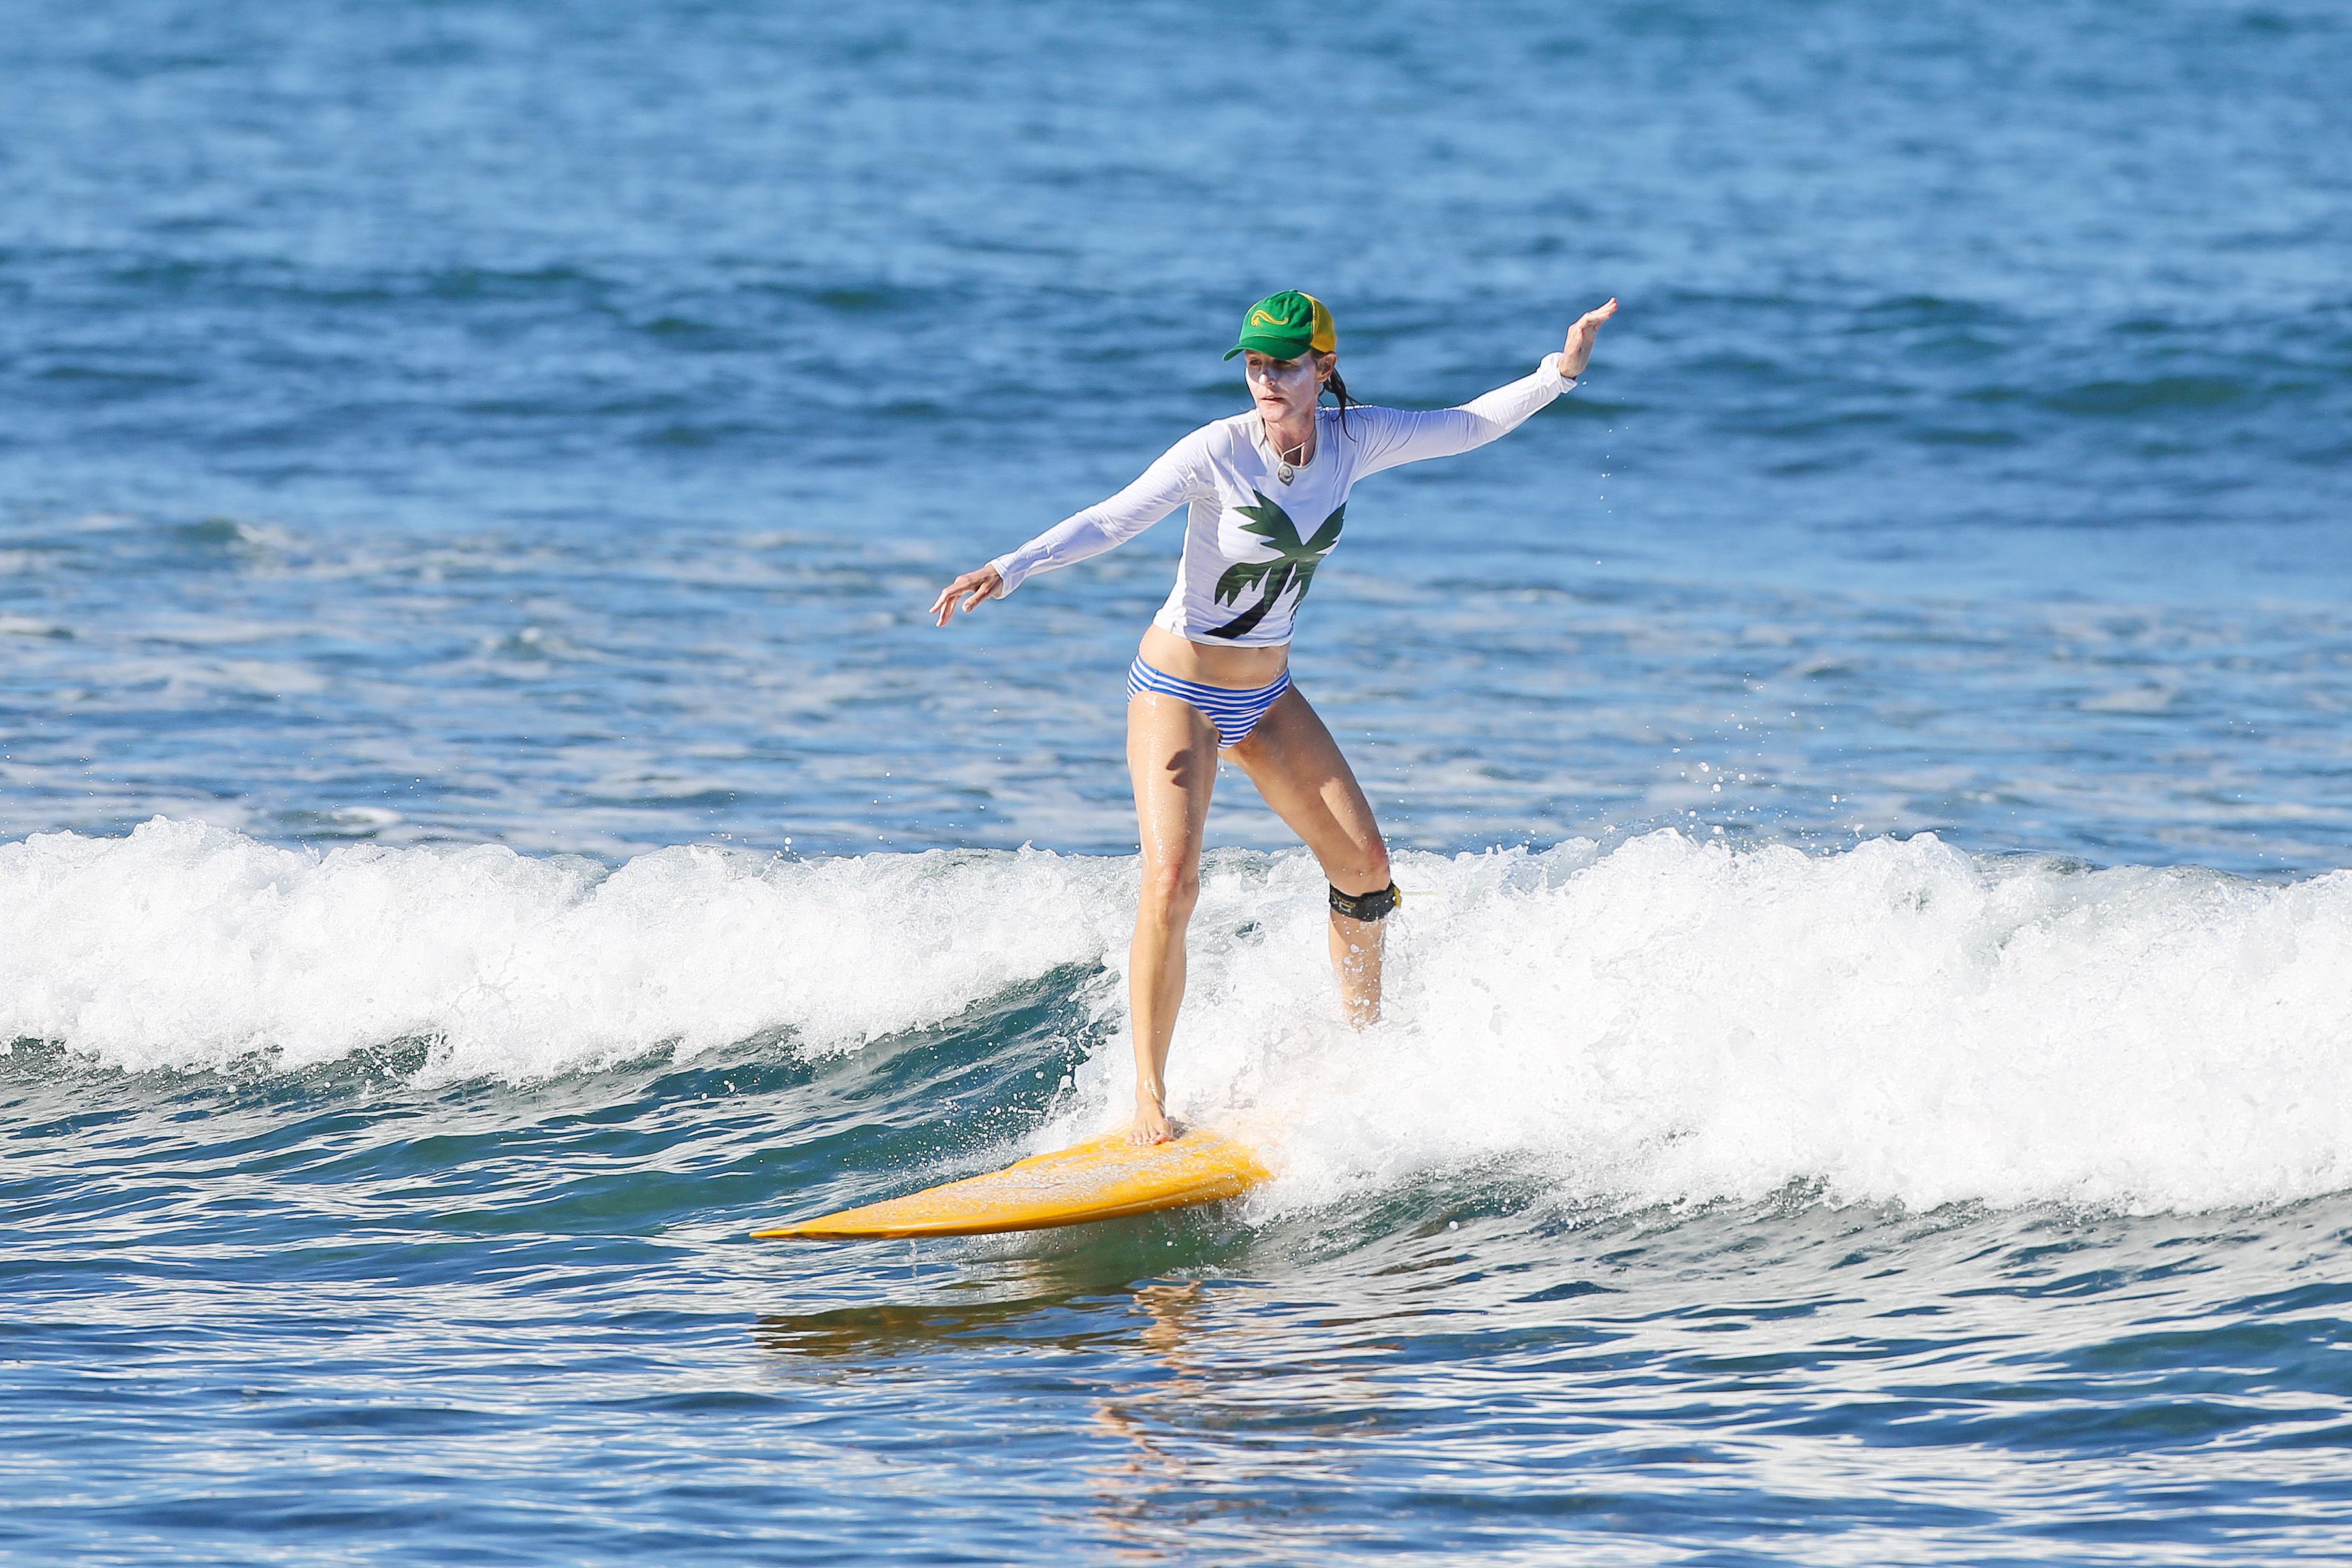 Helen Hunt surfing